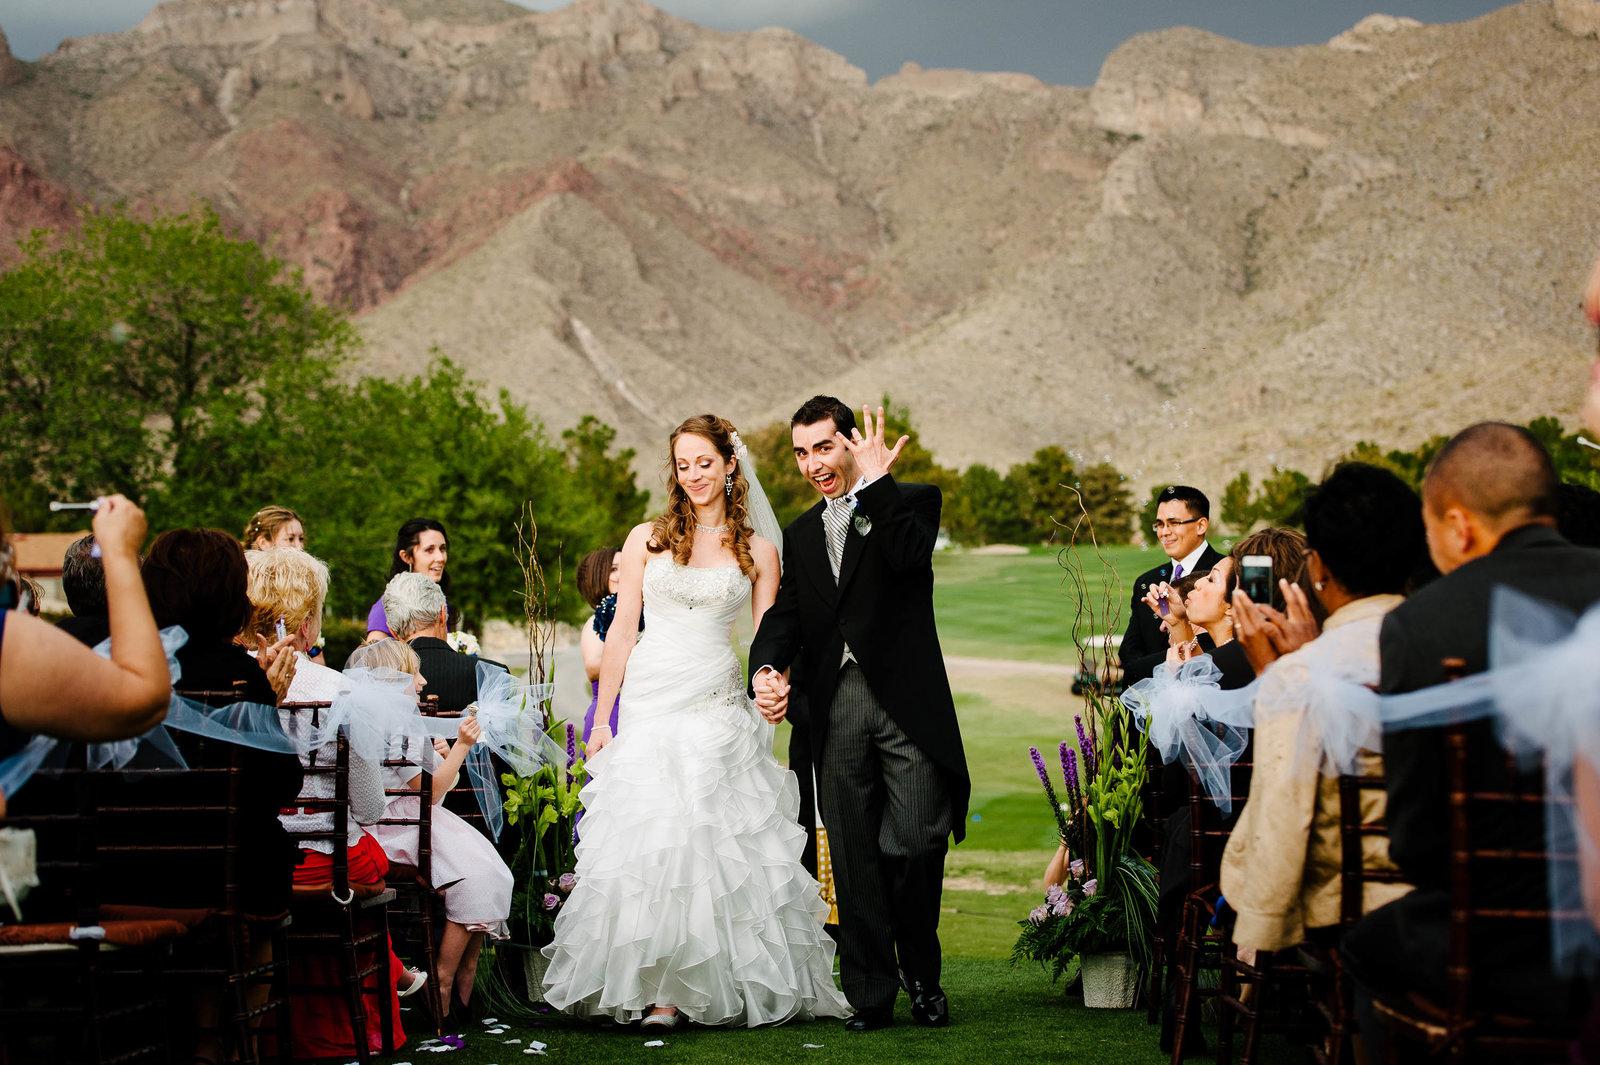 146-El-paso-wedding-photographer-El Paso Wedding Photographer_M32